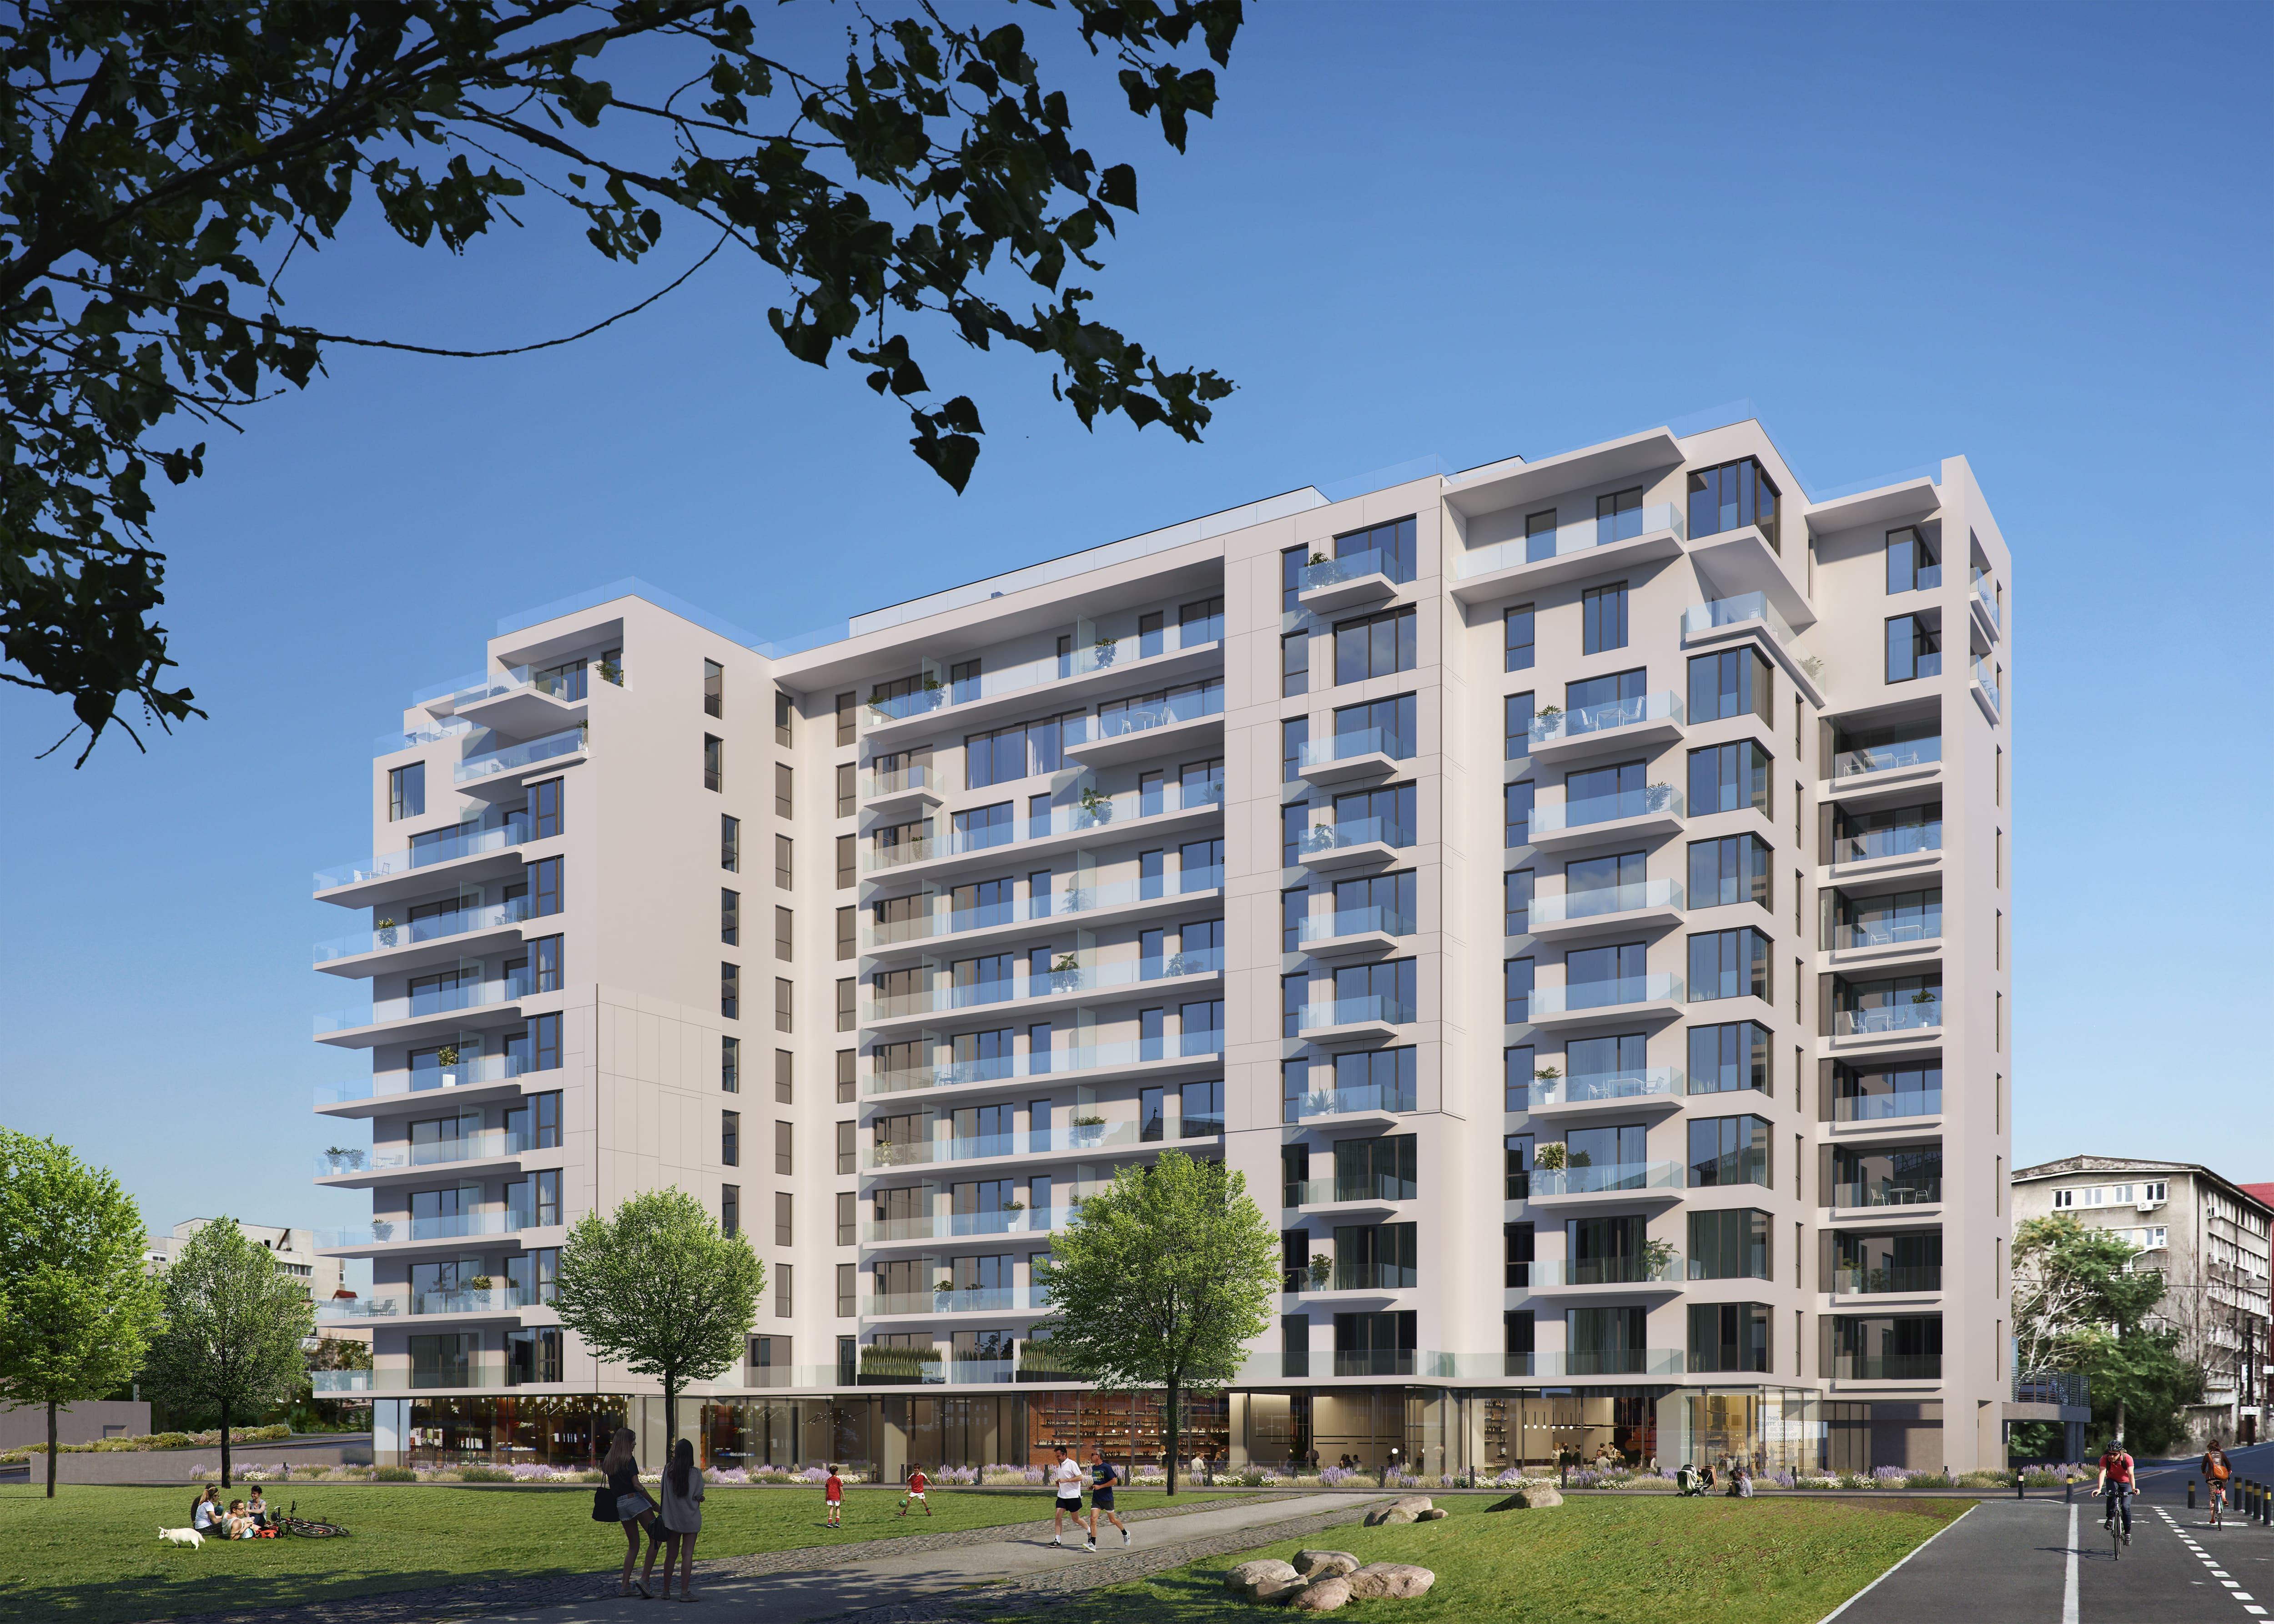 https://ahe-ro.s3.amazonaws.com/8256/penthouse-si-apartamente-unirii-%287%29.jpg